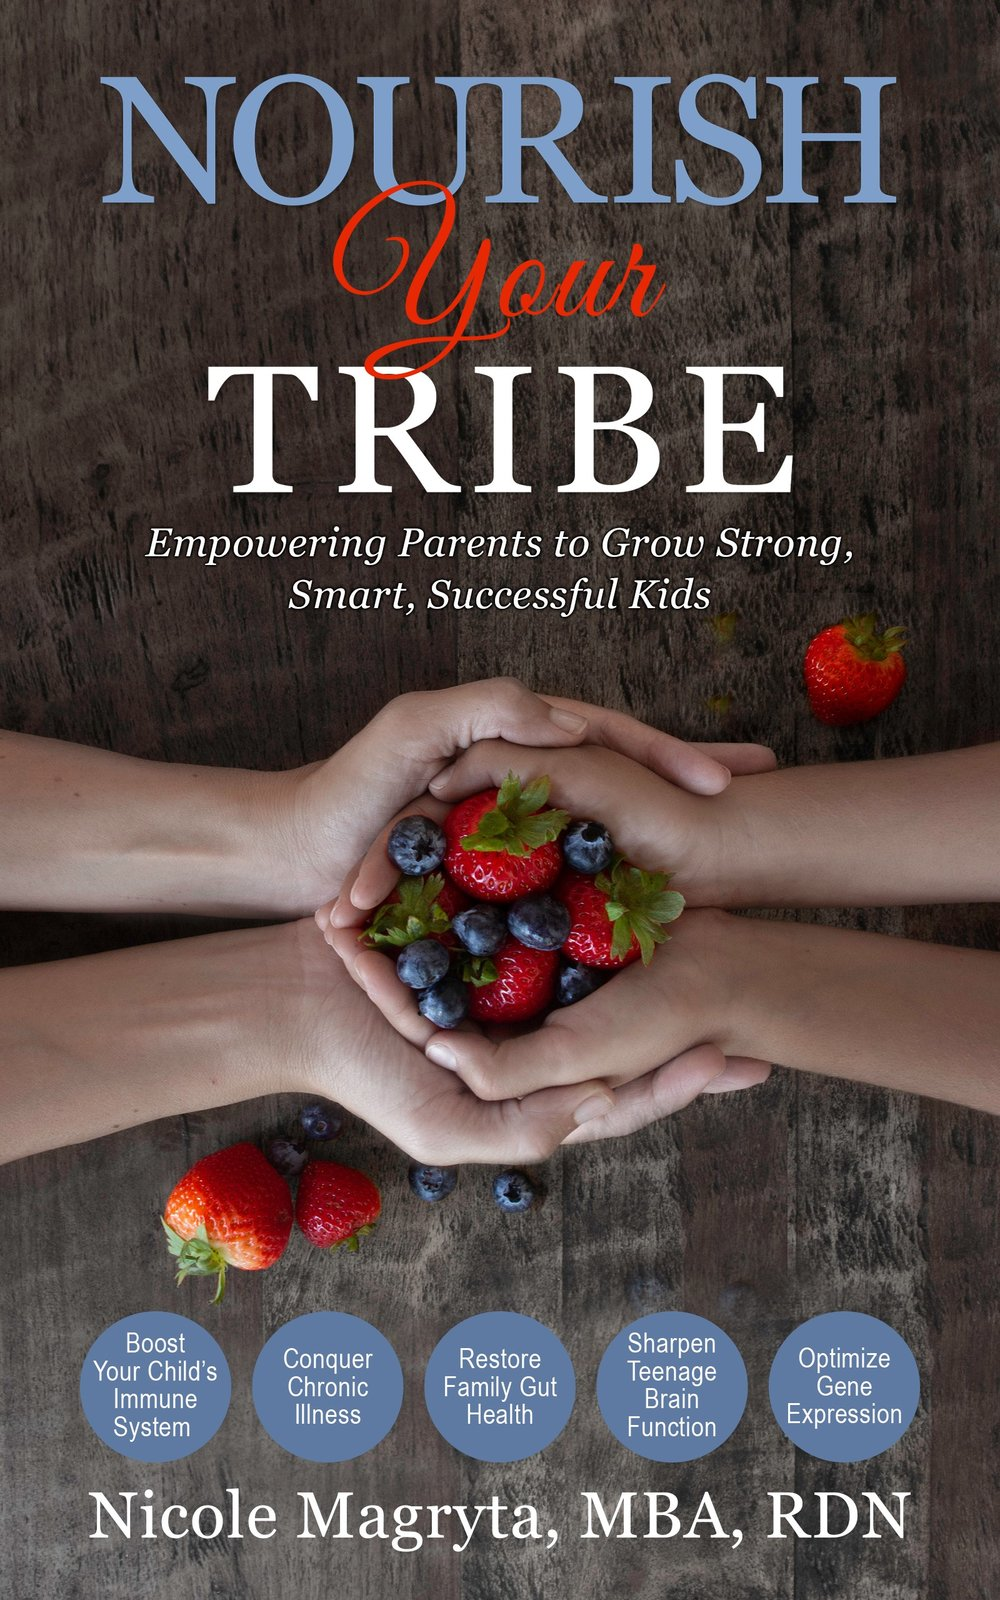 nourish your tribe.jpg